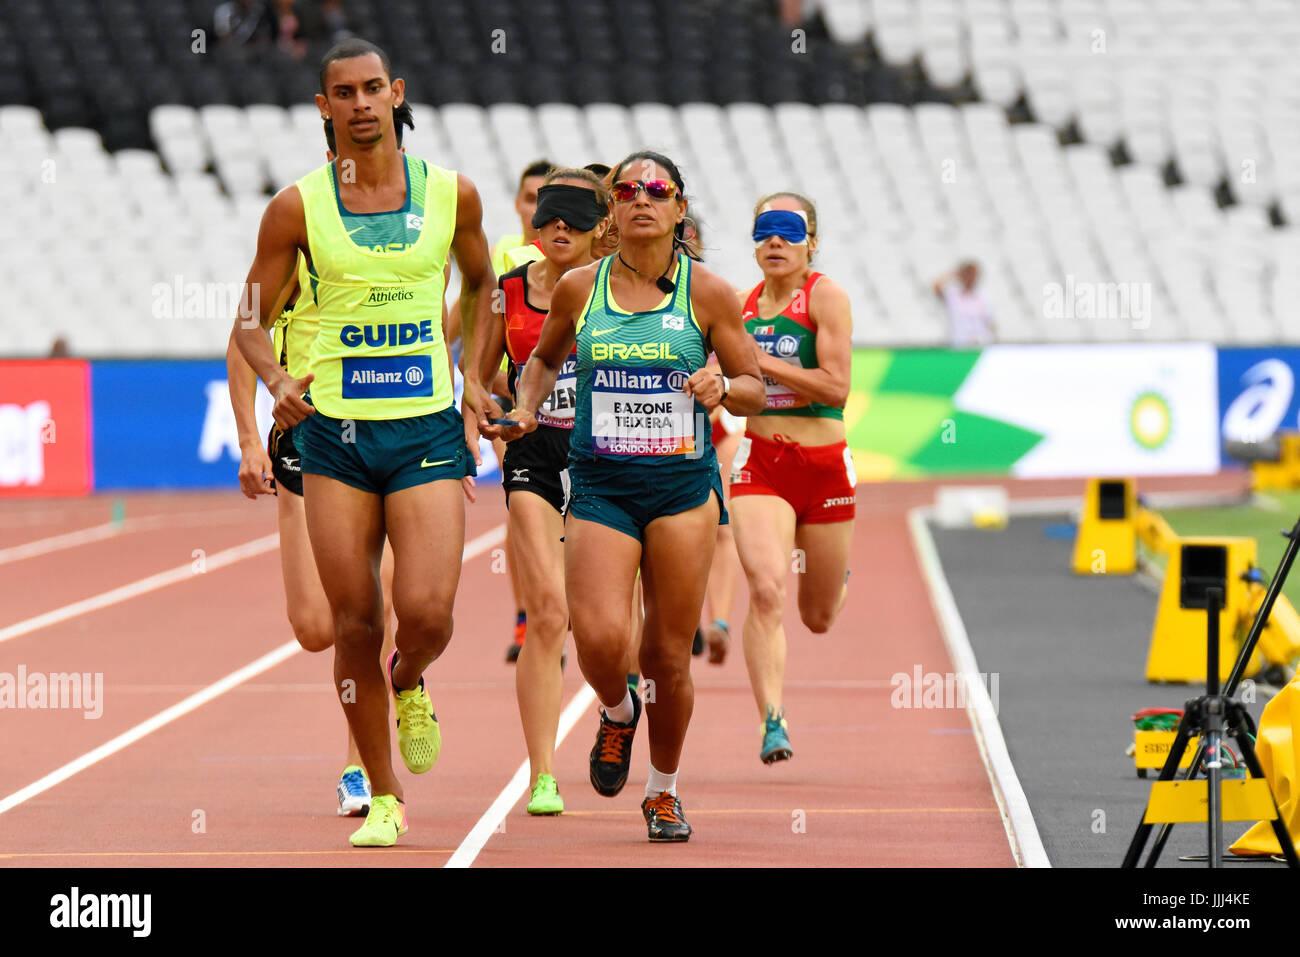 renata-bazone-teixeira-competing-at-the-world-para-athletics-championships-JJJ4KE.jpg